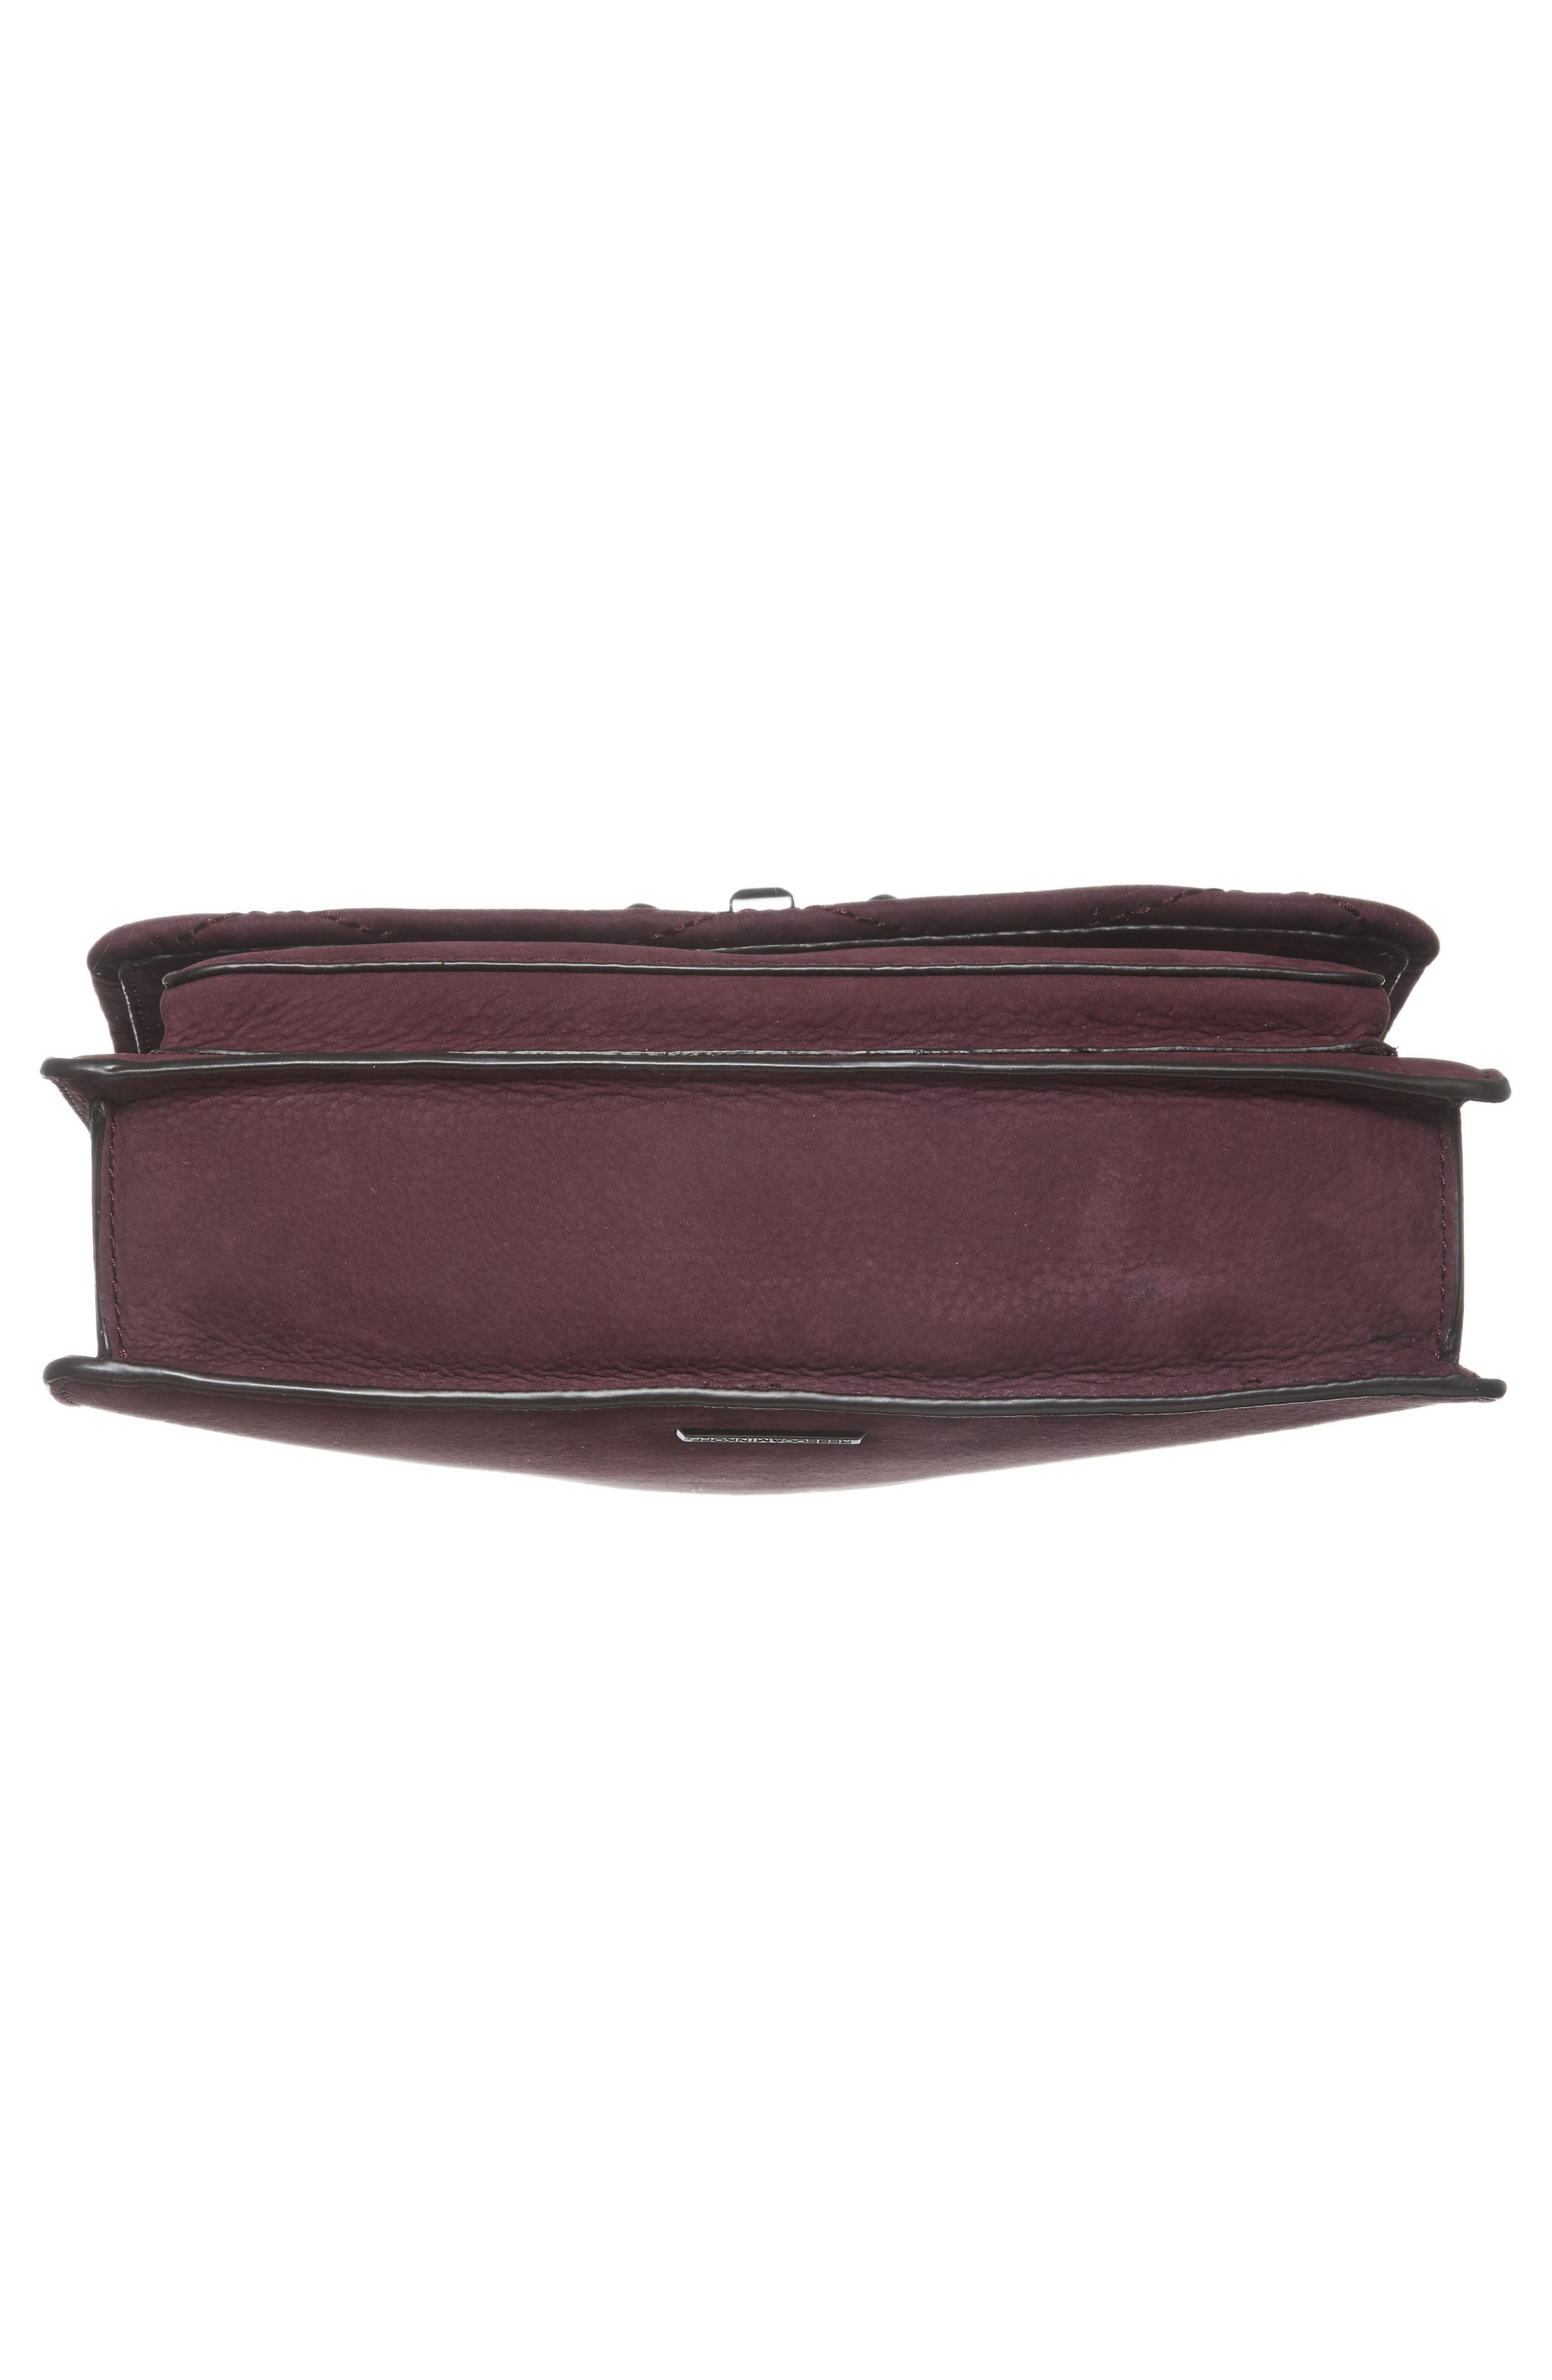 Medium Je T'aime Convertible Leather Crossbody Bag,                             Alternate thumbnail 56, color,